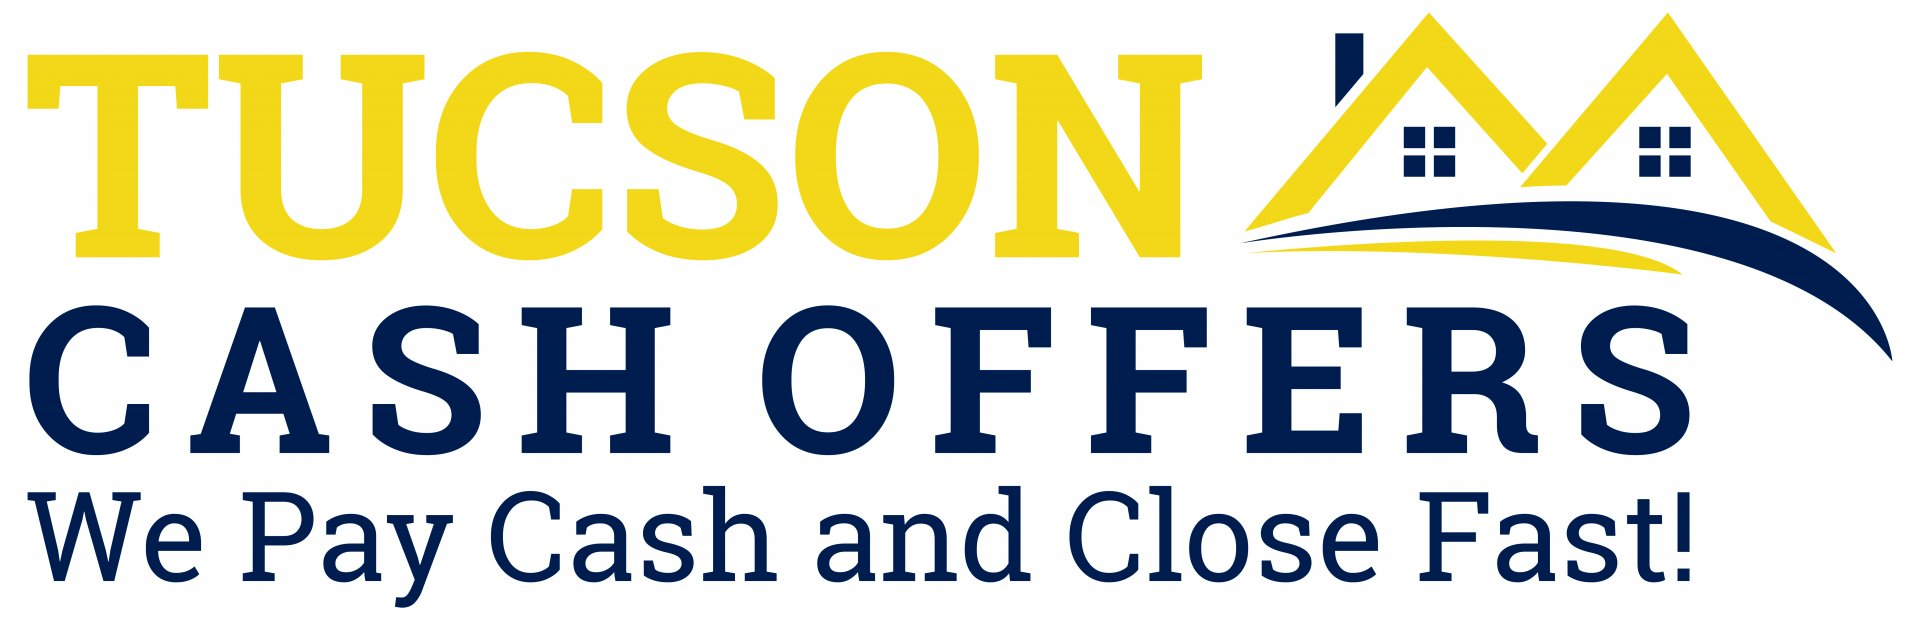 Tucson Cash Offers logo